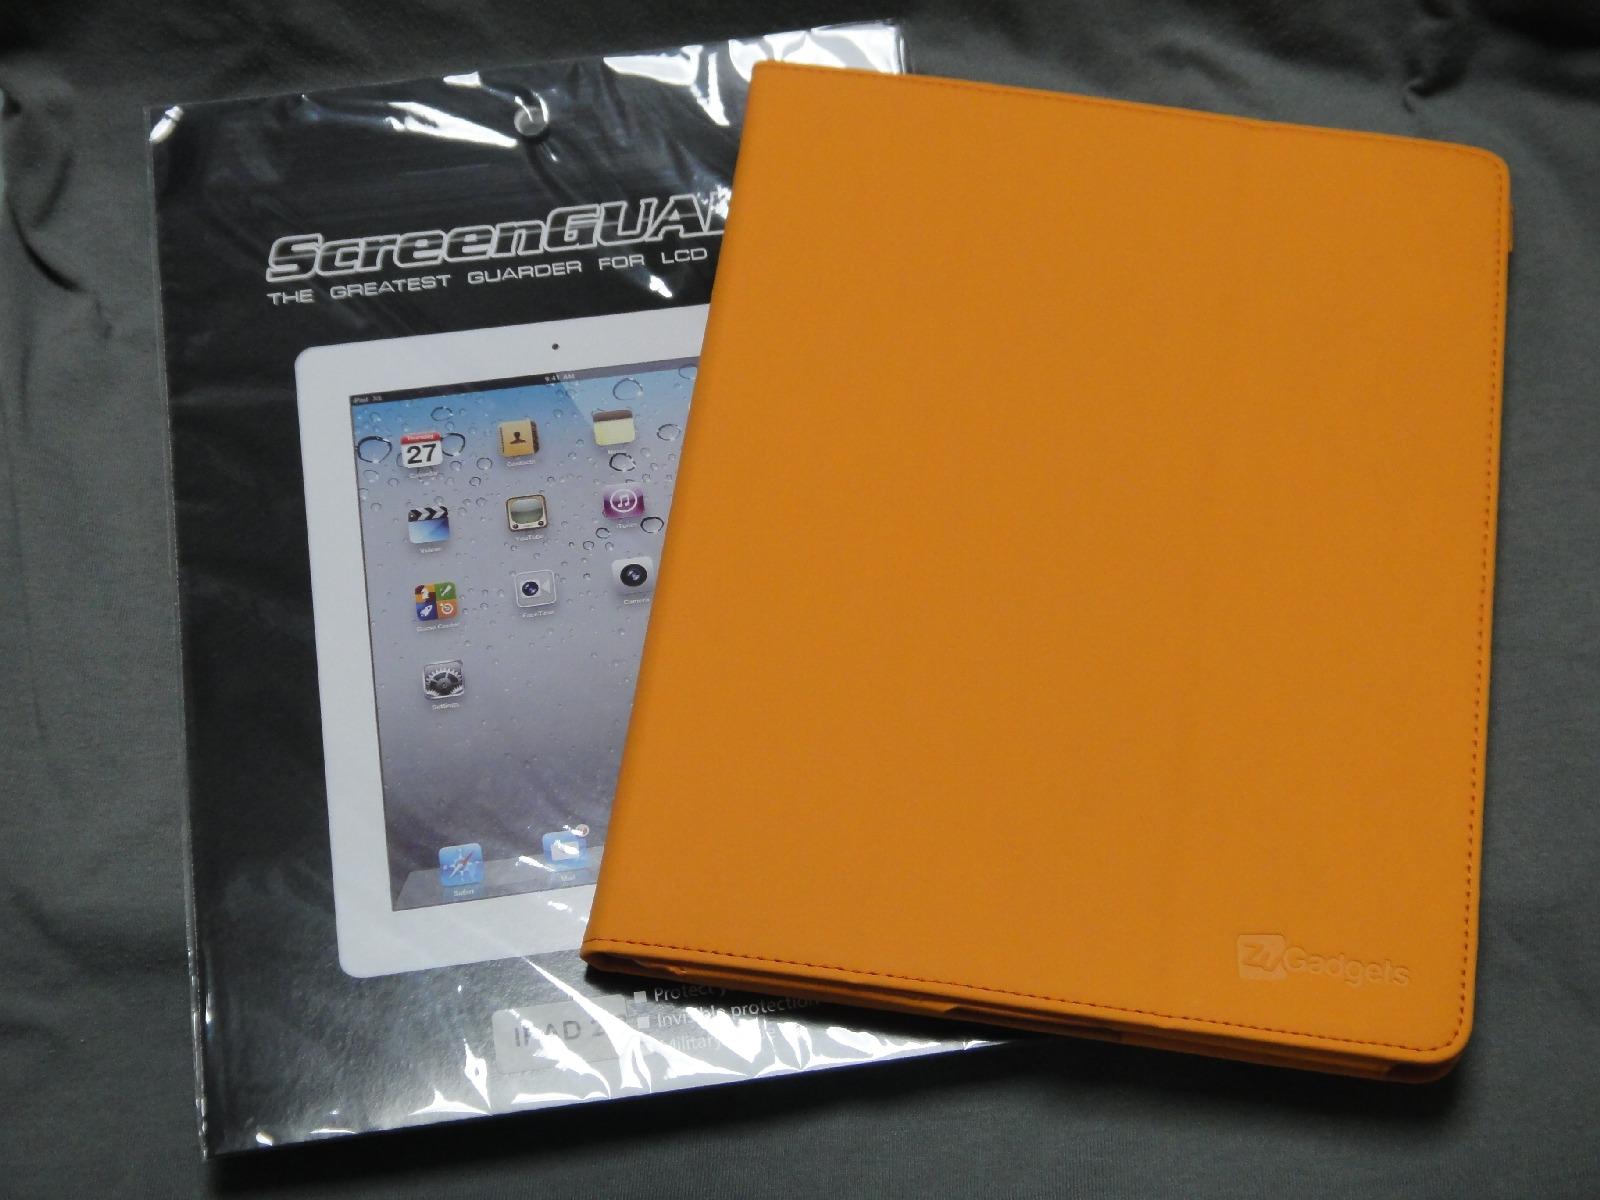 iBeansiPadcase_006.jpg